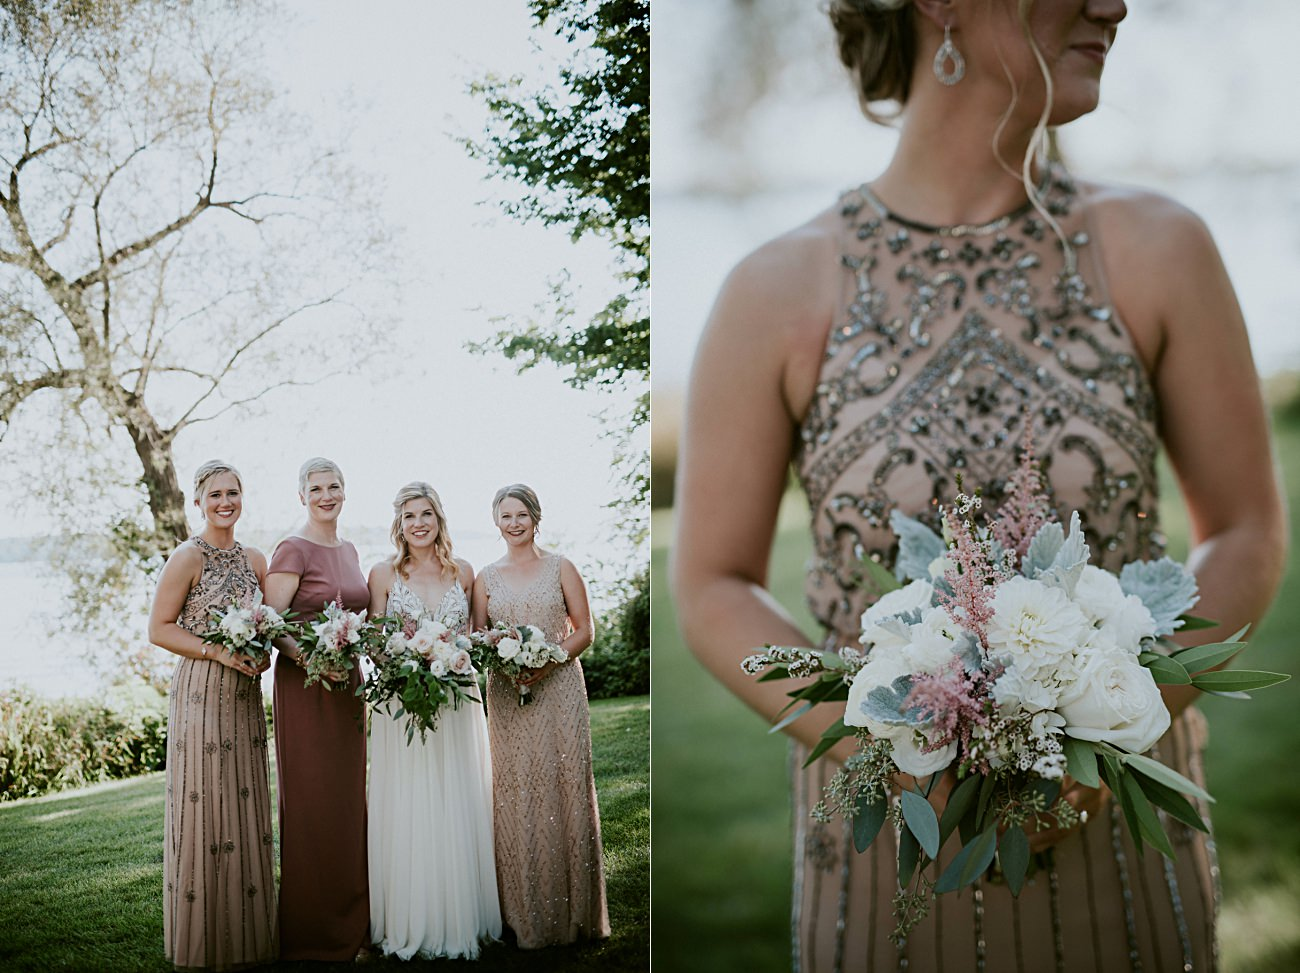 jewlel toned bridal gowns - Lakeside wedding in Green Lake Wisconsin -Heidel House Wedding - Green Lake Wisconsin Wedding